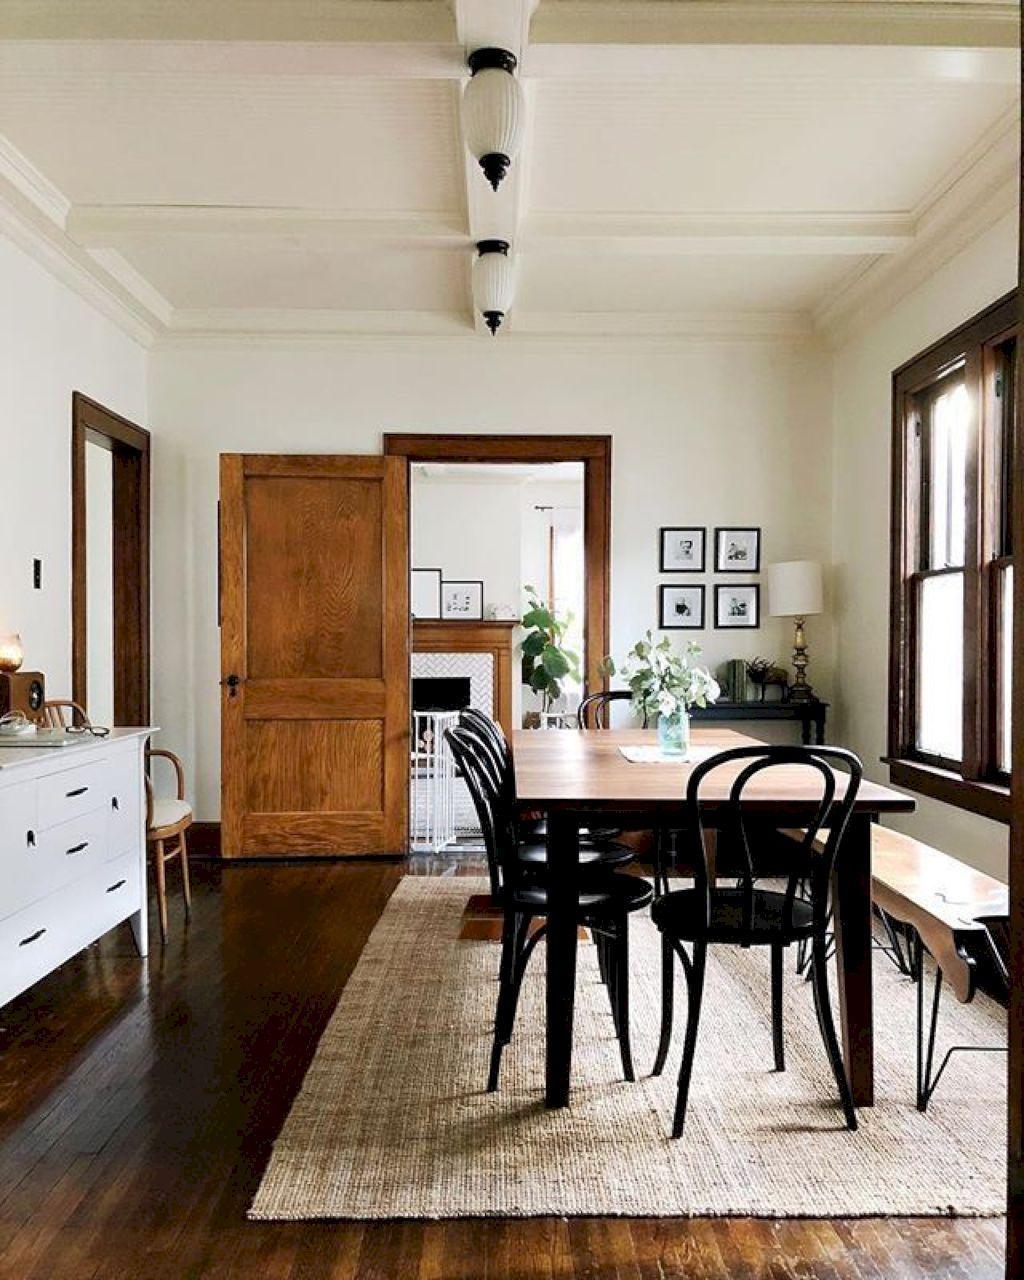 Luxury Farmhouse Interior Design: 100+ BRILLIANT FARMHOUSE DINING ROOM DESIGN AND DECOR